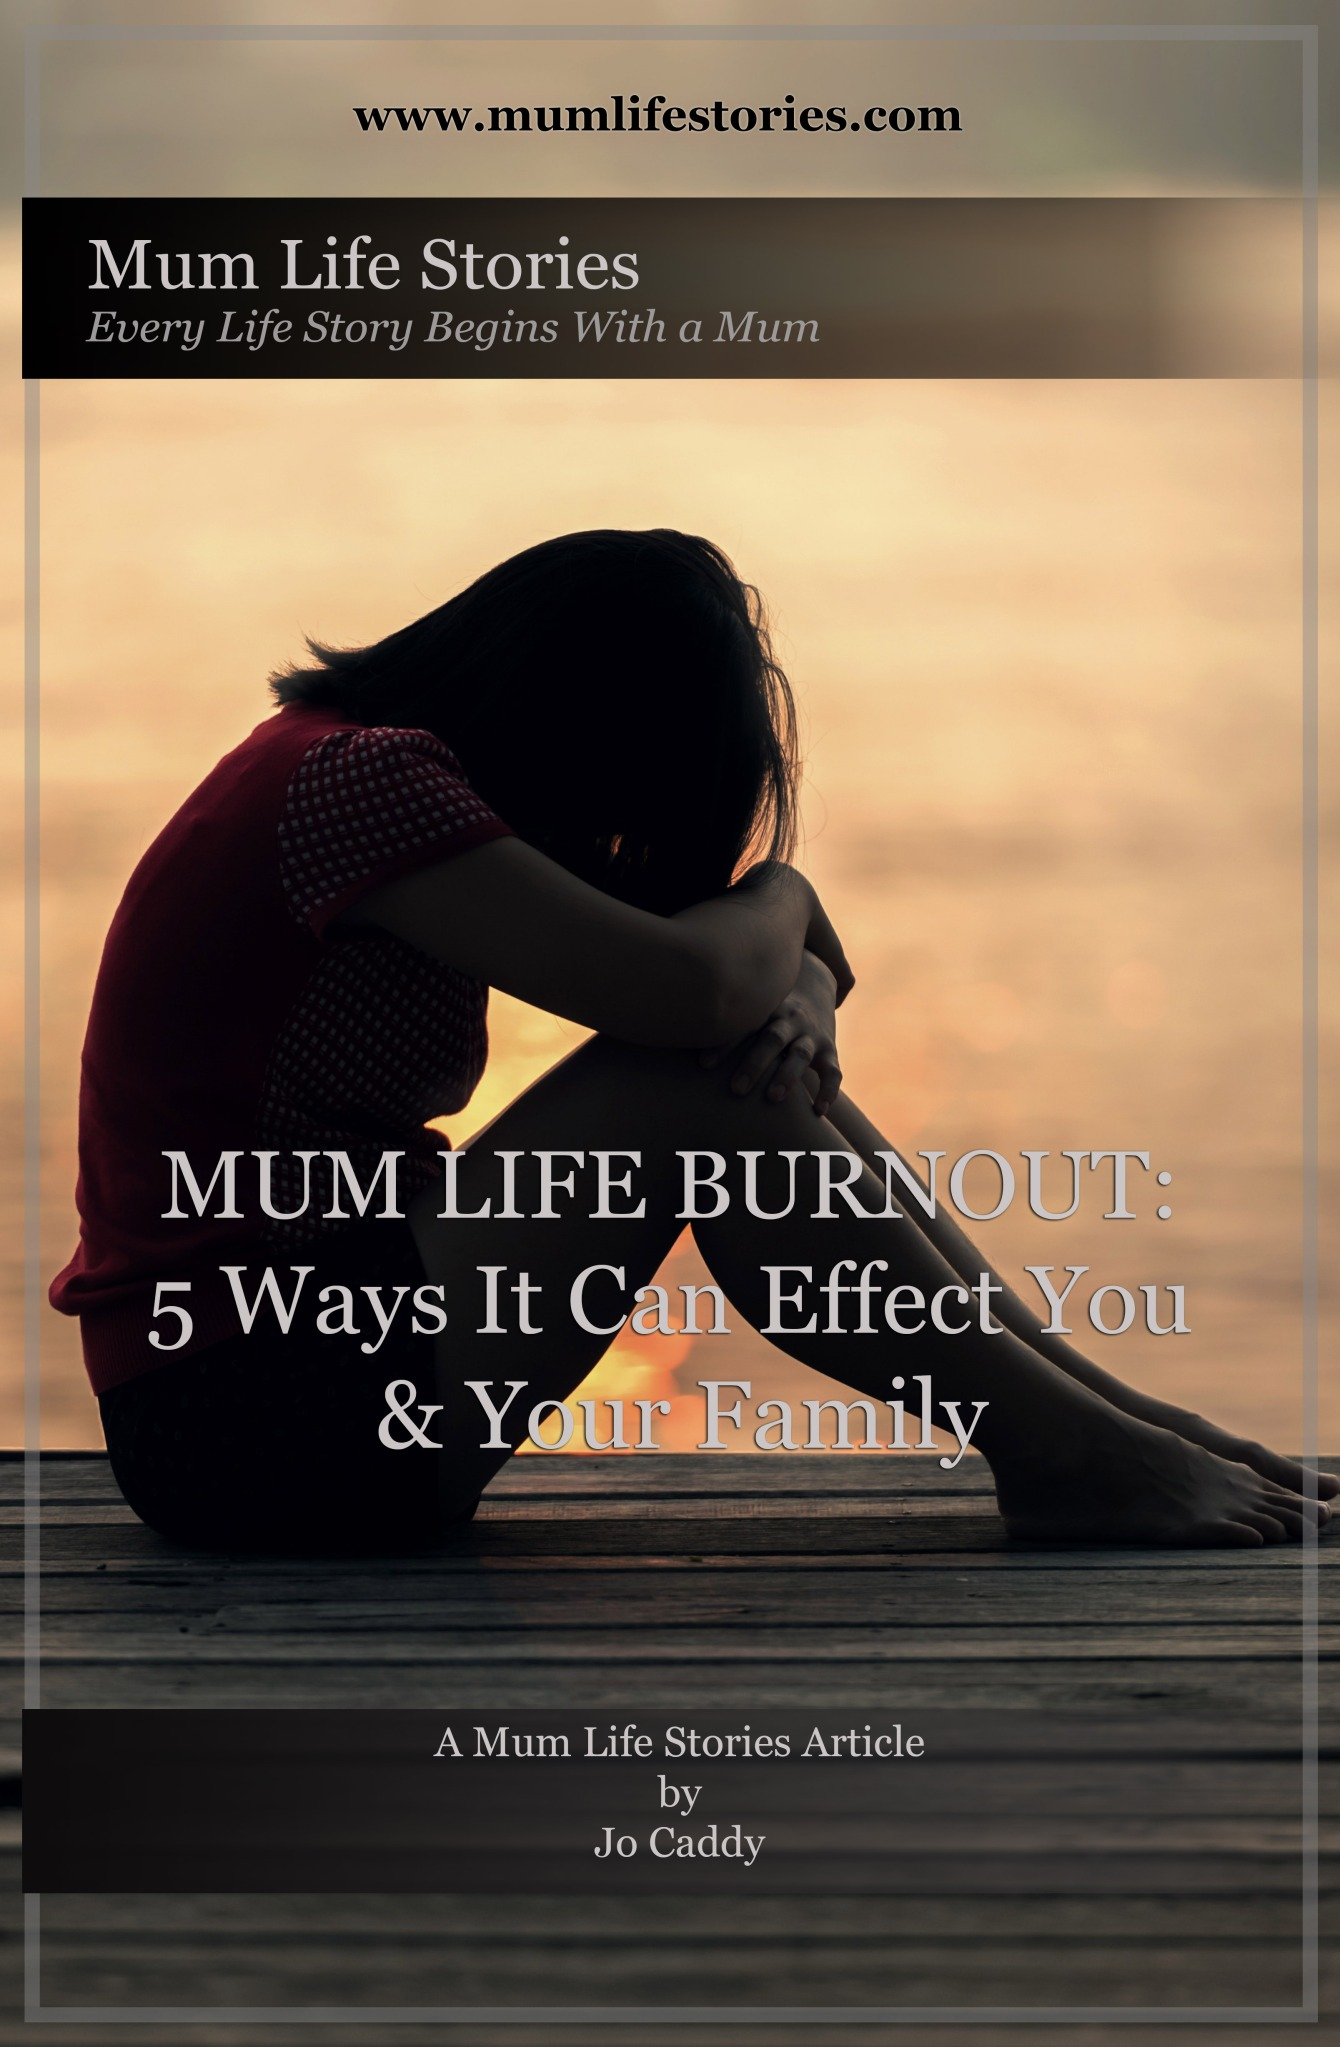 mum life burnout article cover